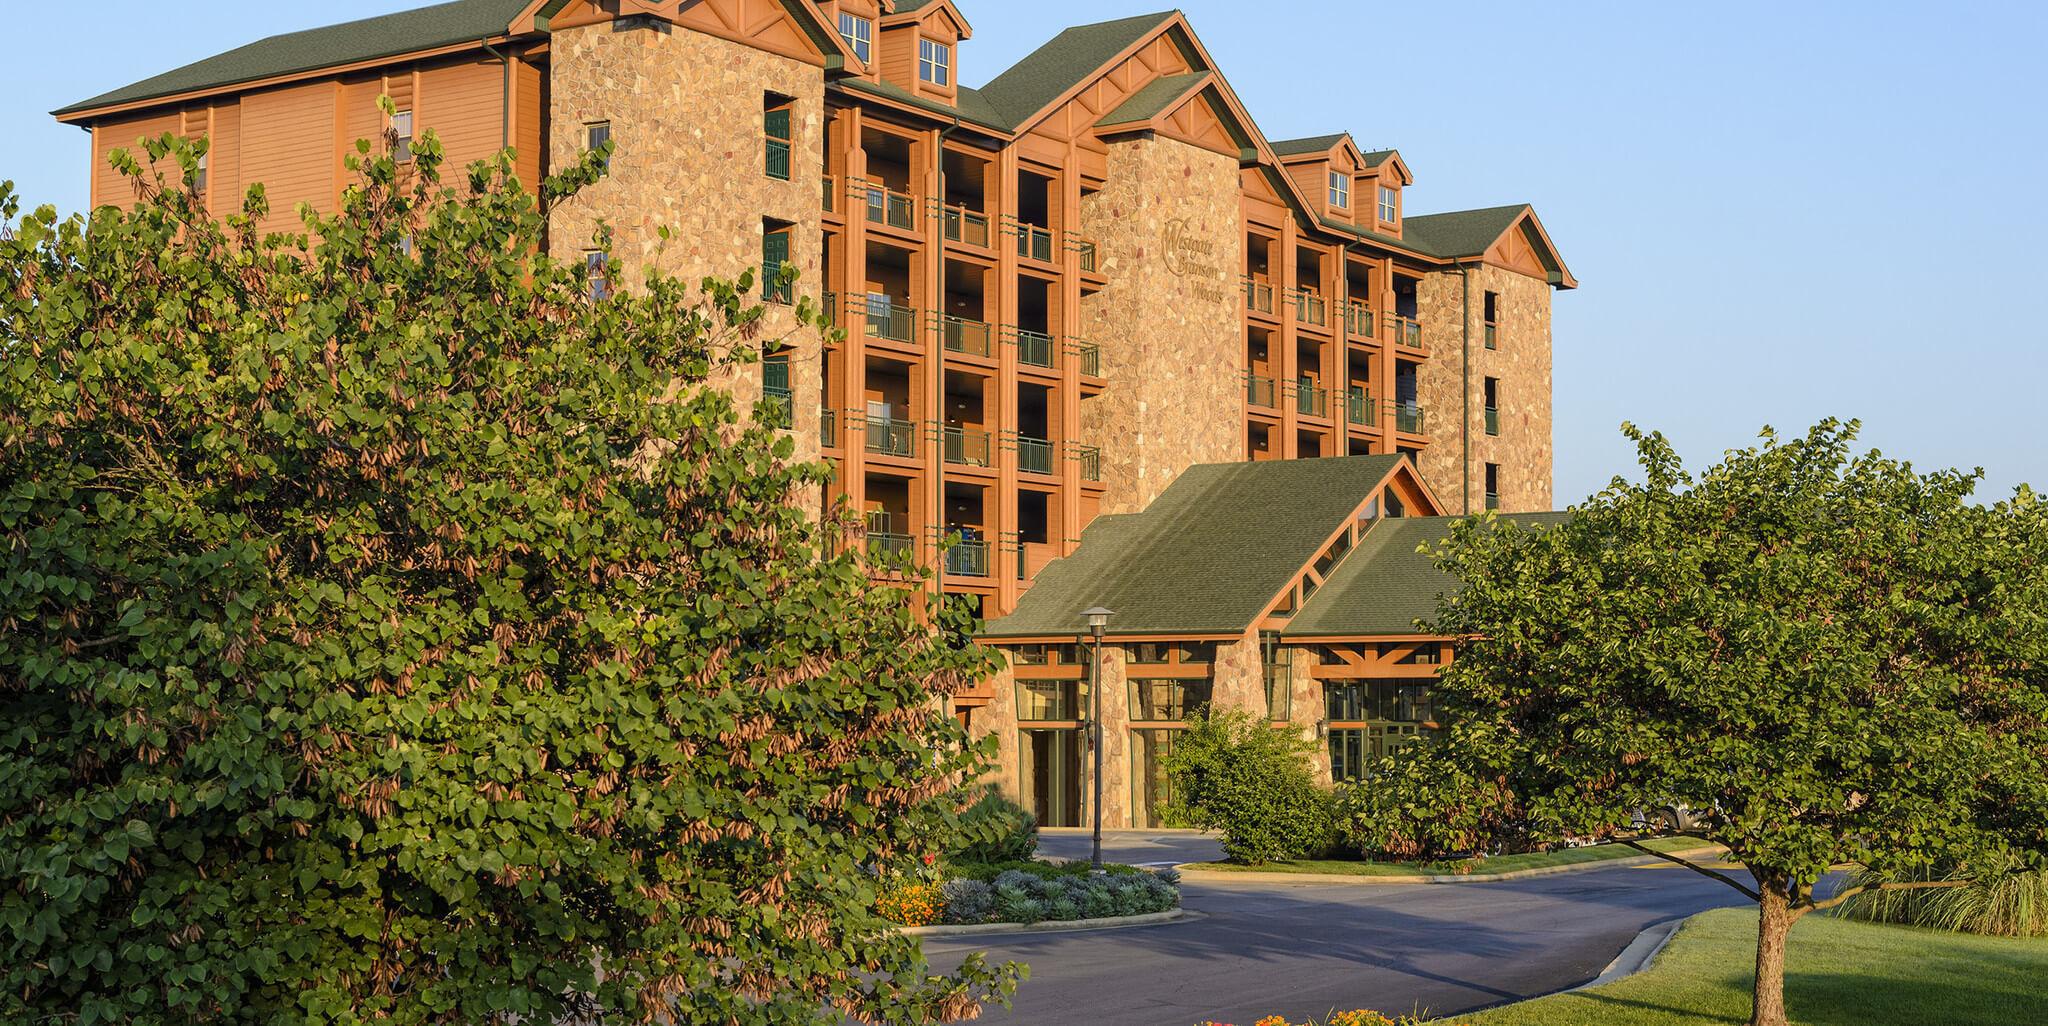 Visit Westgate Branson Woods Resort Resorts In Branson MO - Branson missouri casinos map